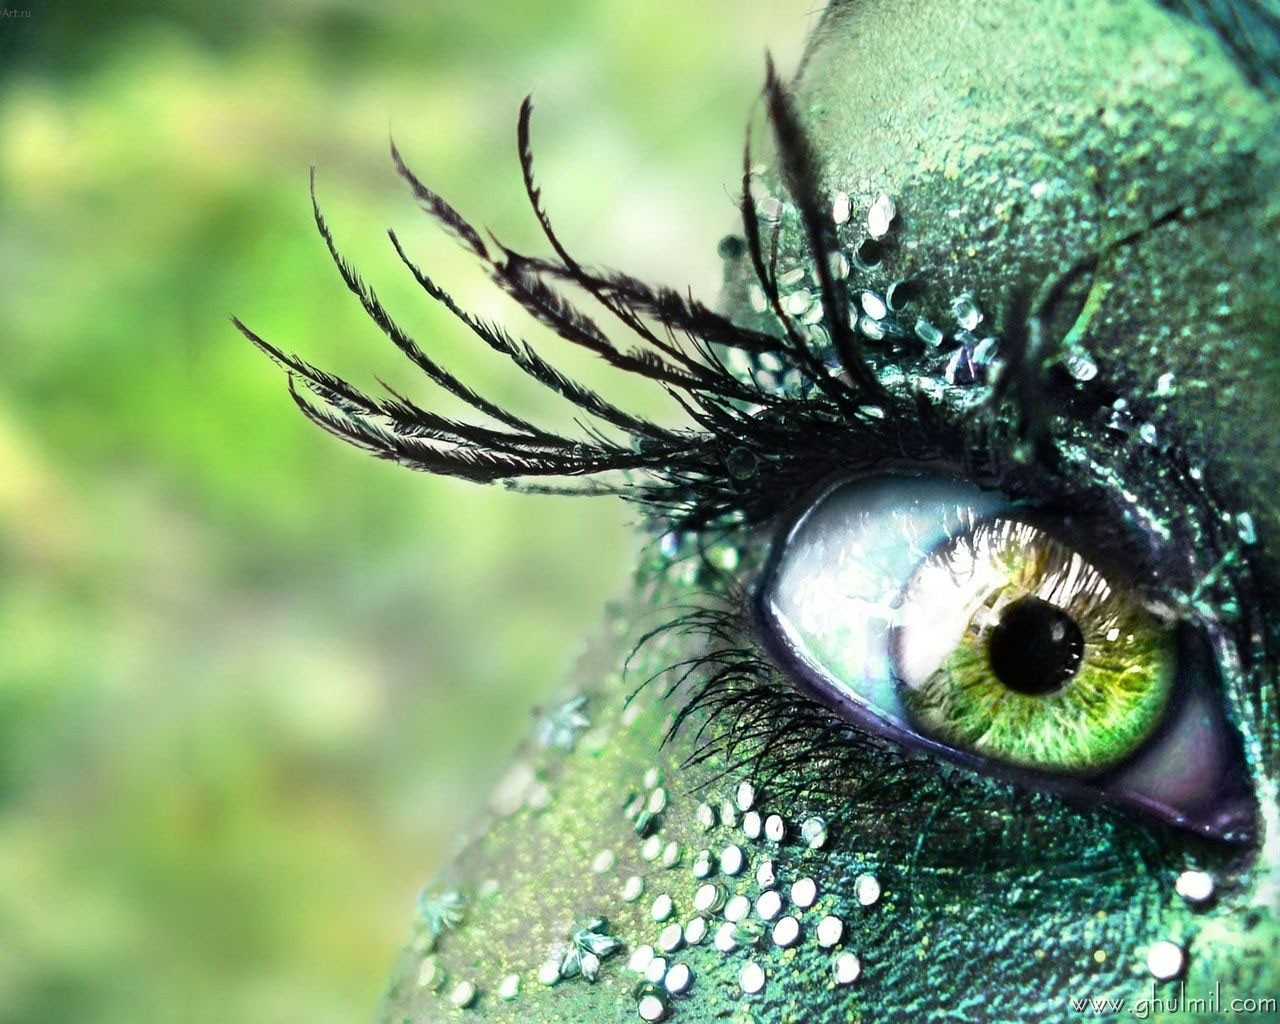 beautiful colorful 3d hd eye wallpaper for desktops E Entertainment 1280x1024